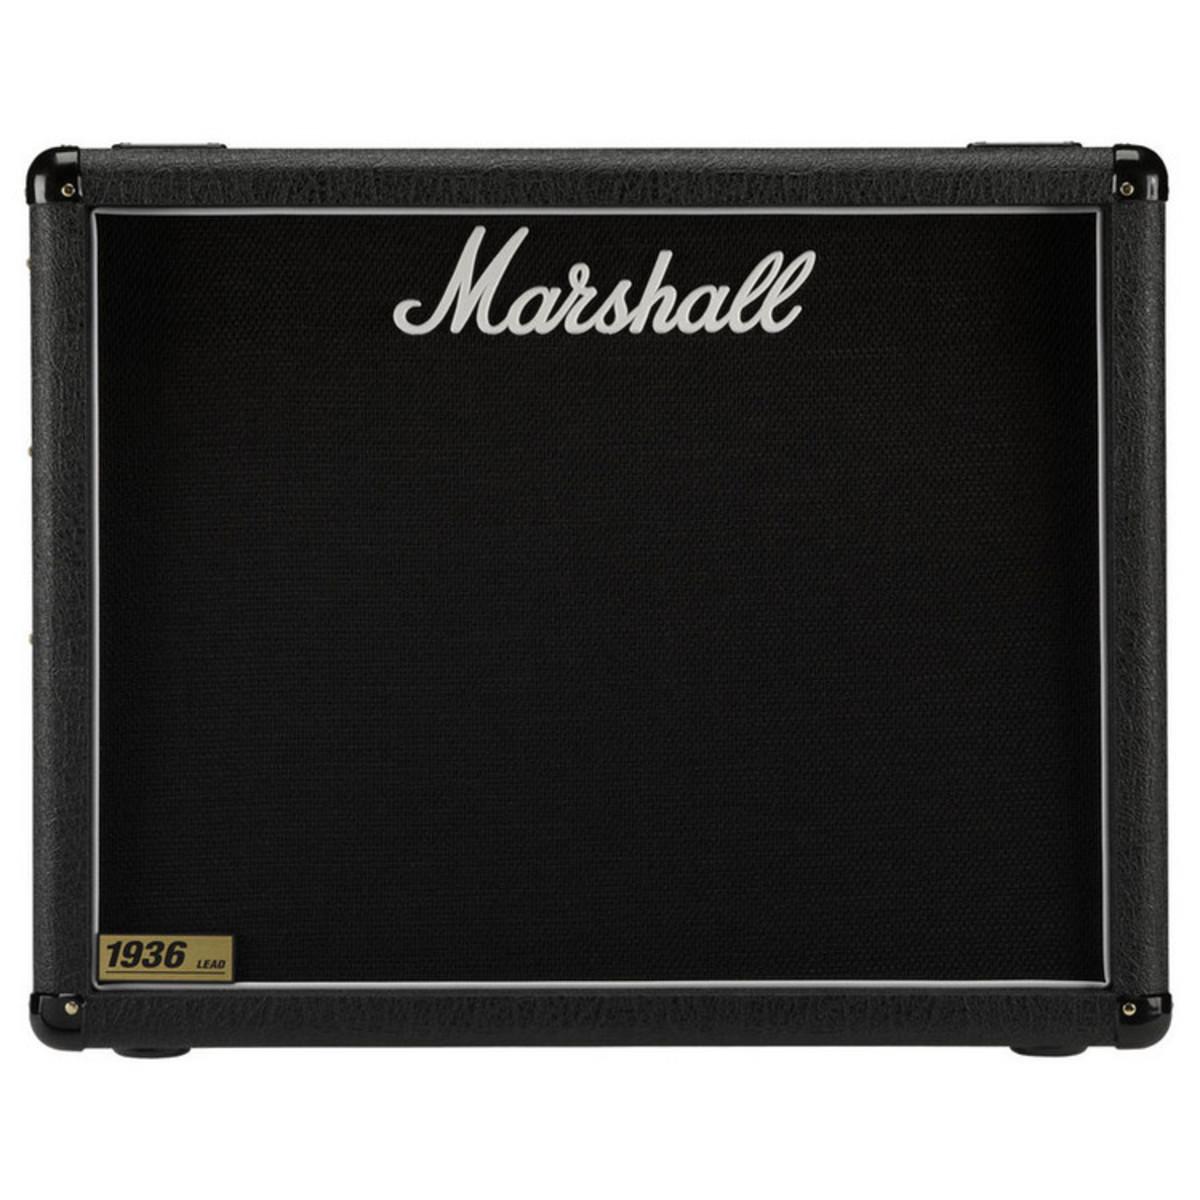 marshall 1936 2x12 guitar speaker cab at gear4music. Black Bedroom Furniture Sets. Home Design Ideas